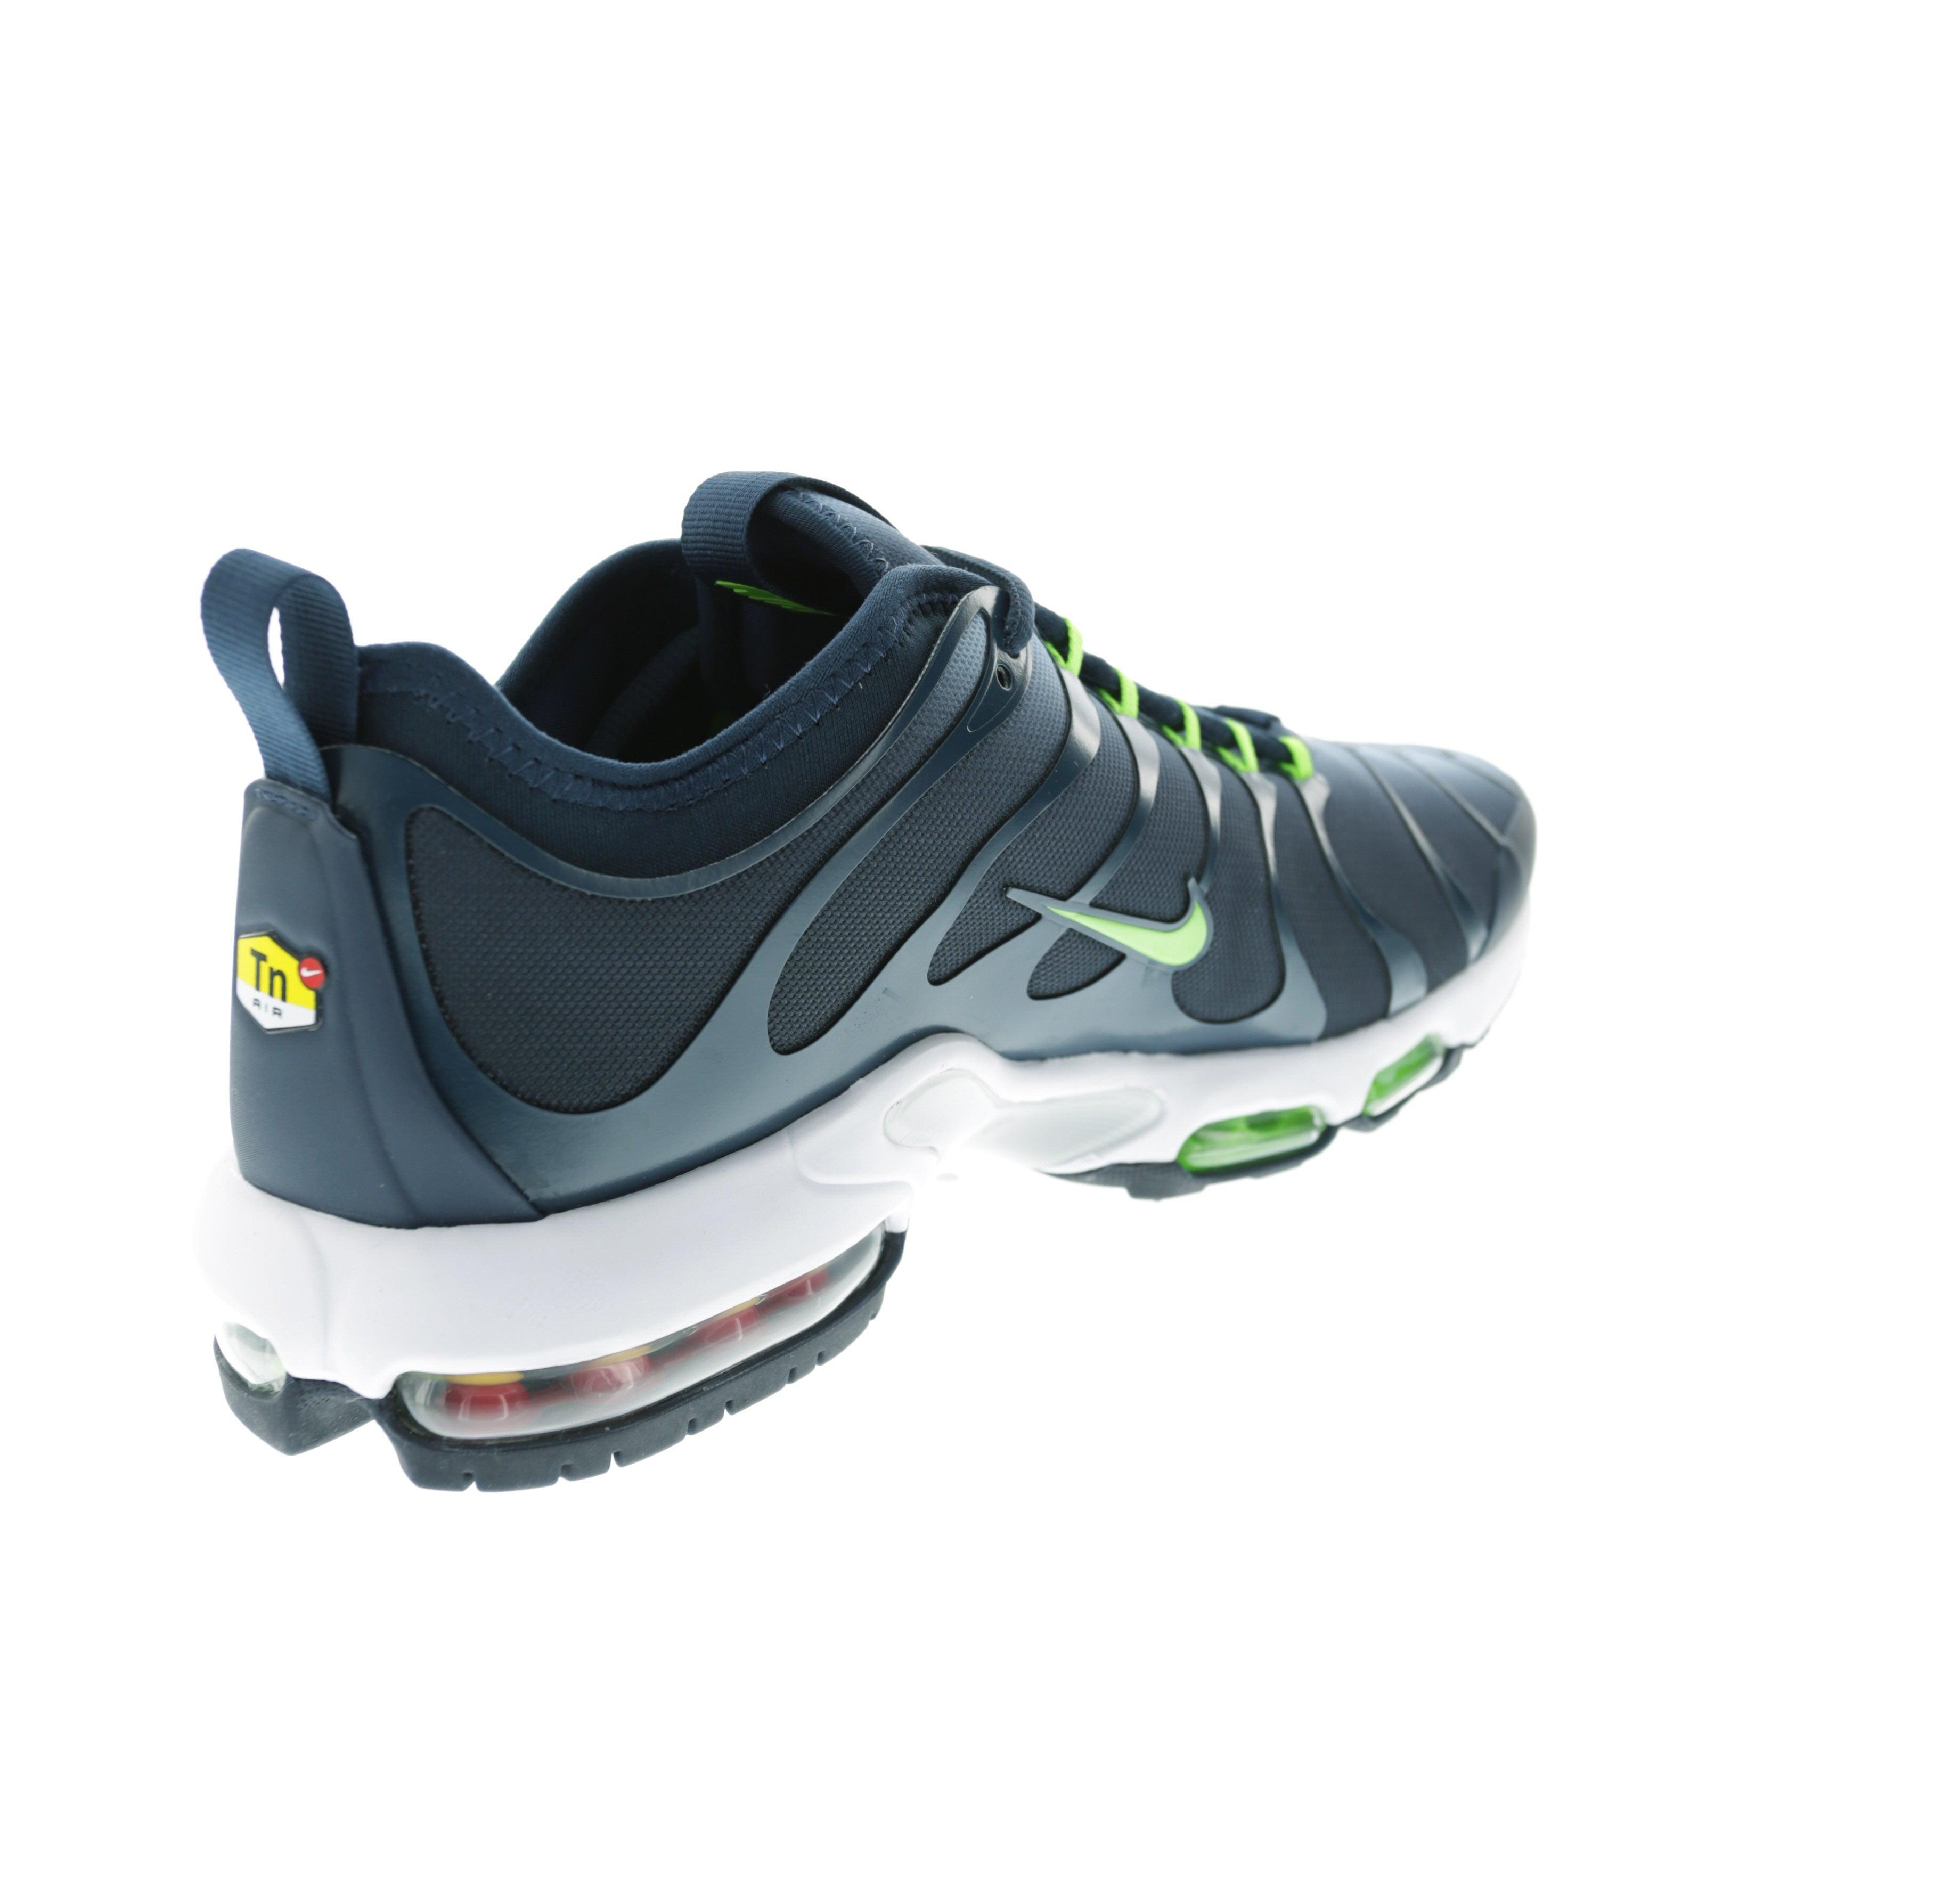 Nike Air Max Plus TN Ultra NavyGreenWhite